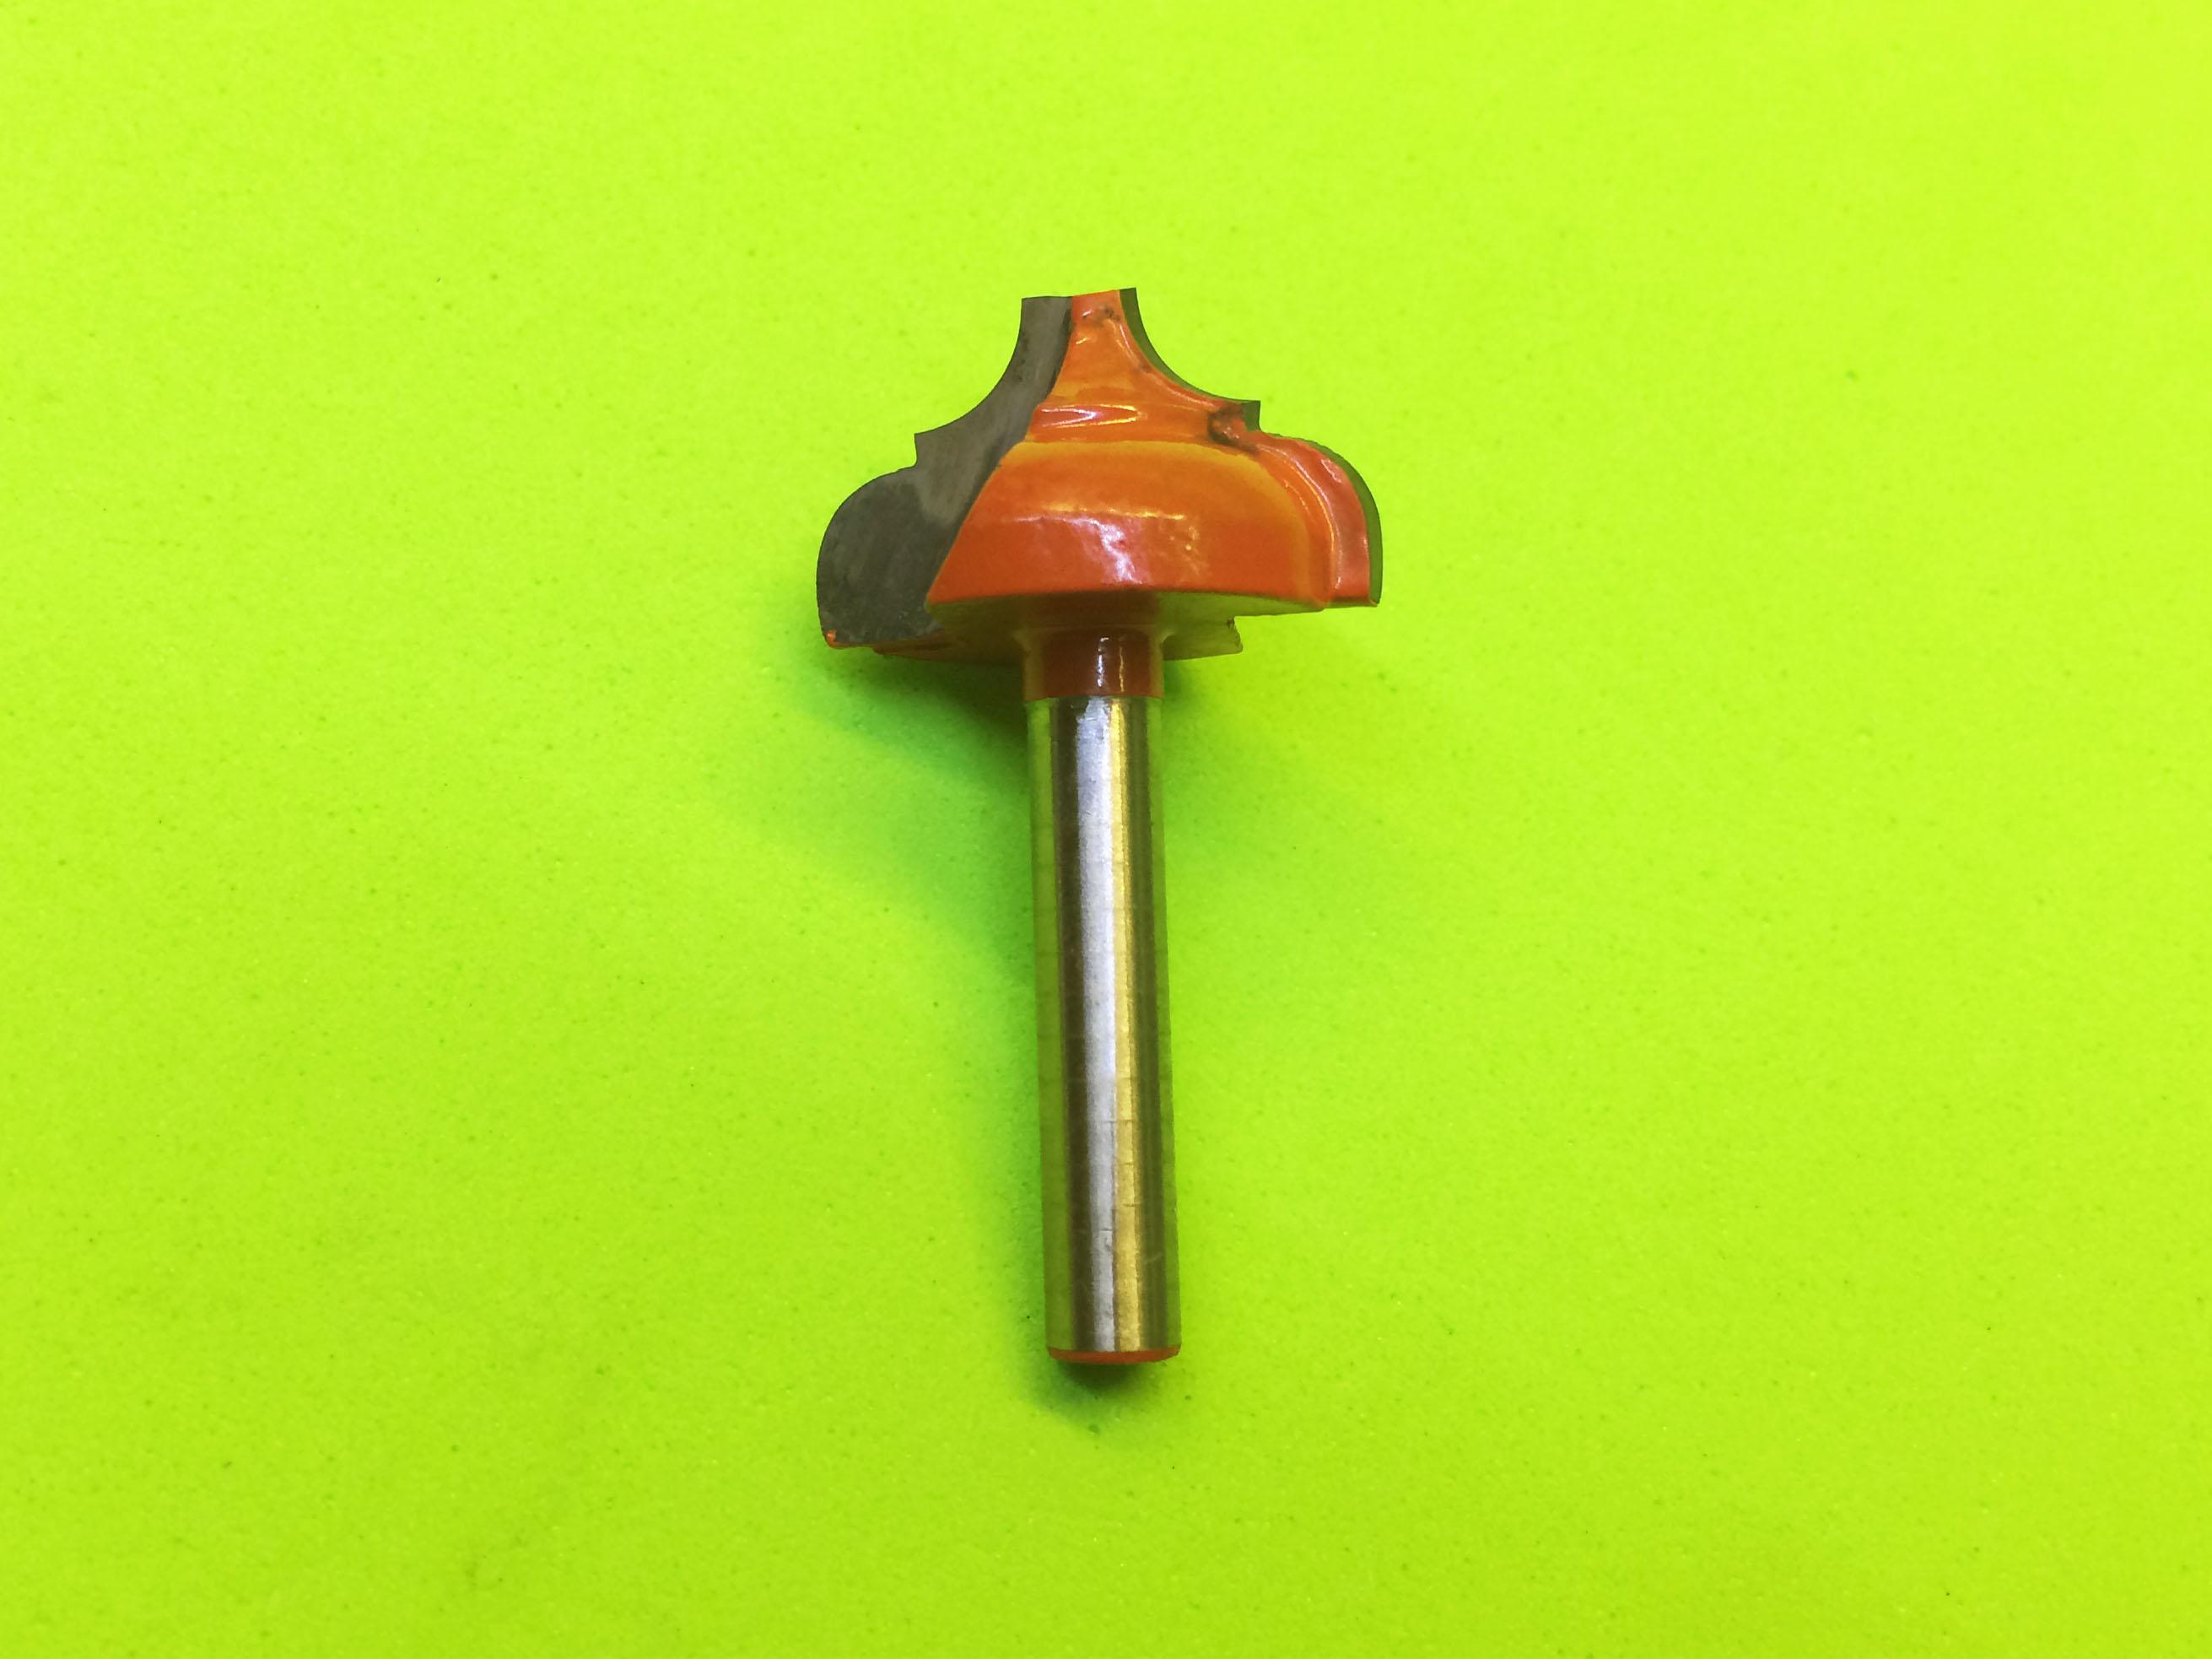 Mũi phay gỗ tạo kiểu B trục 6mm